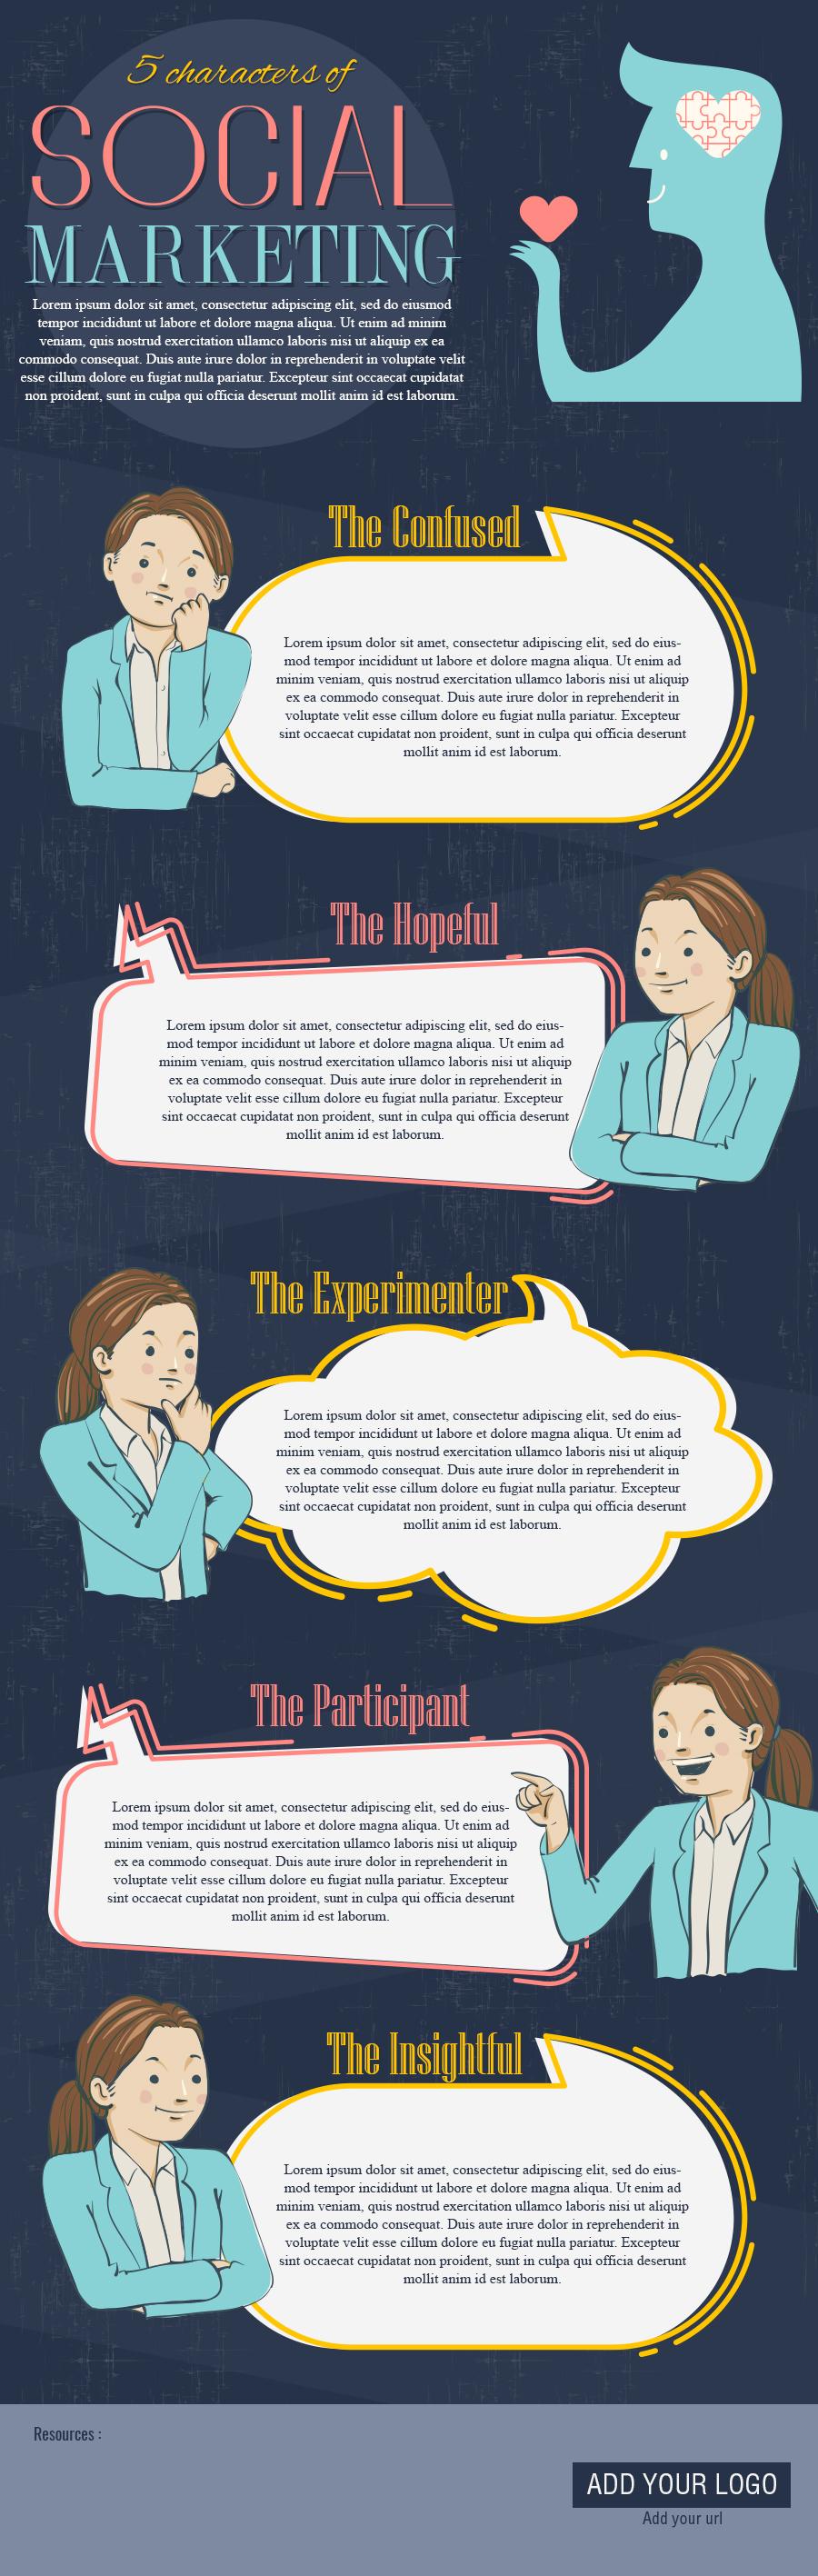 Social marketing - Infographic